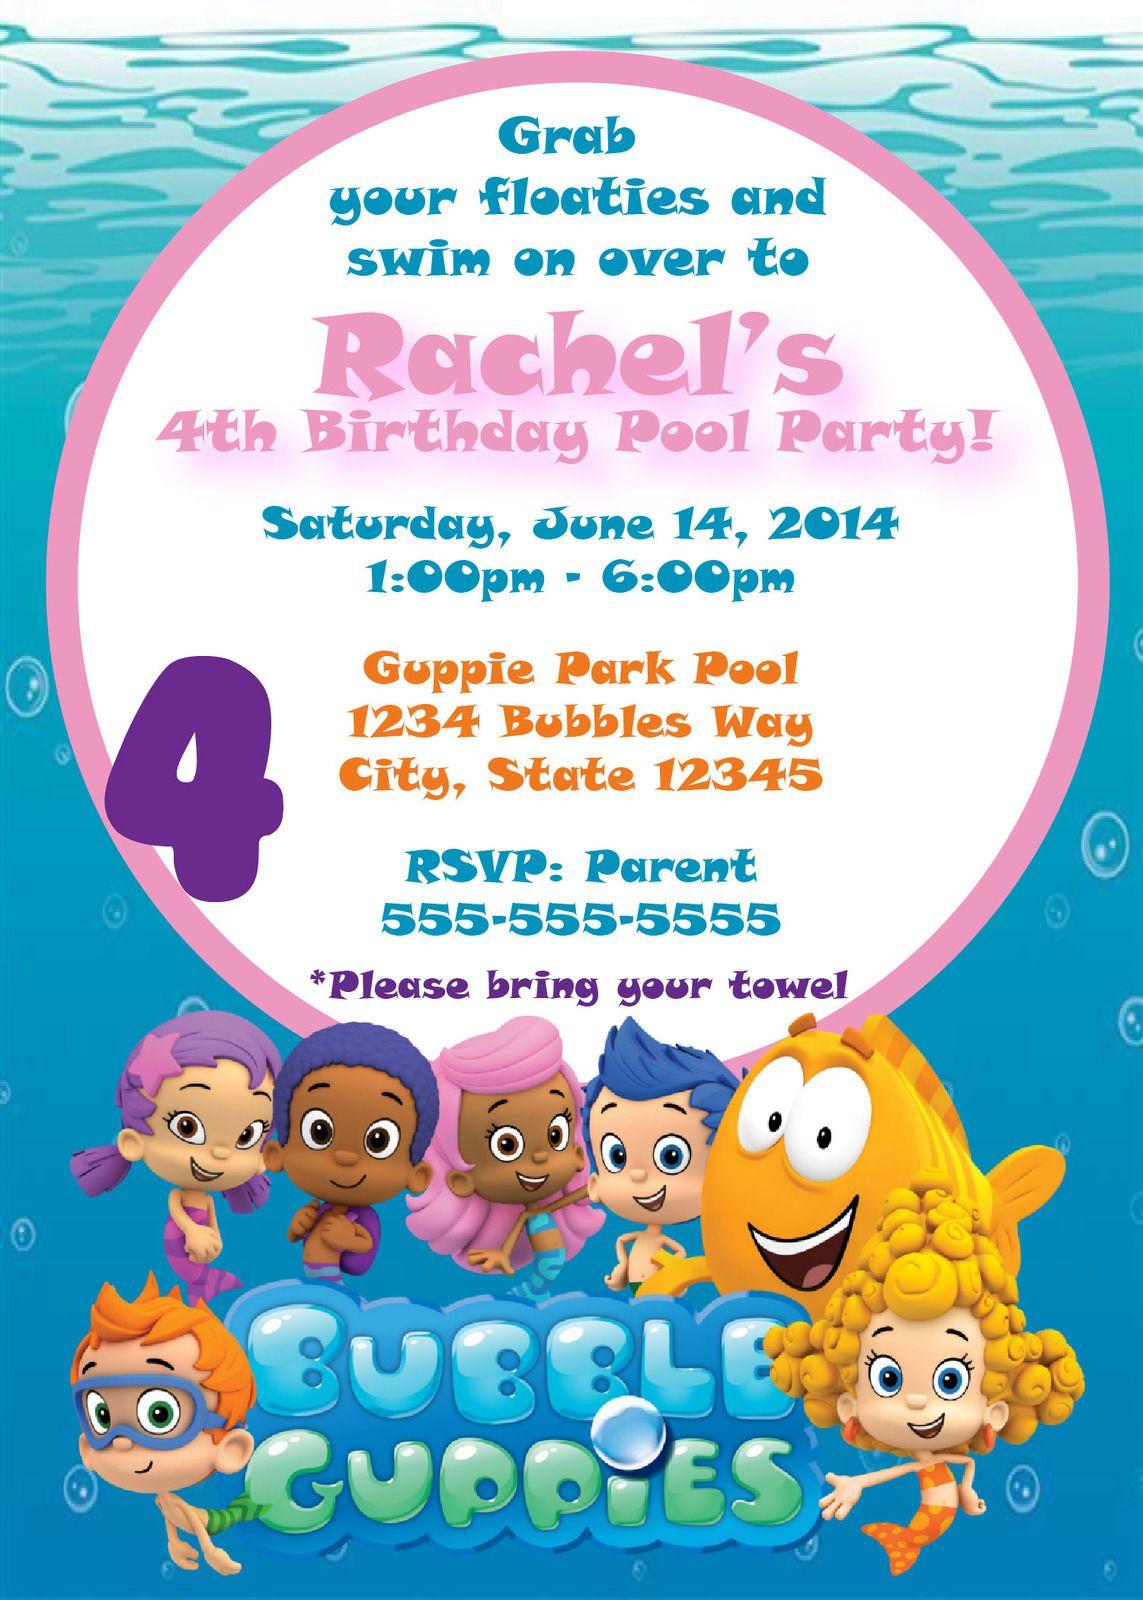 Bubble Guppies Digital Birthday Invitation – Bubble Guppies Party Invites